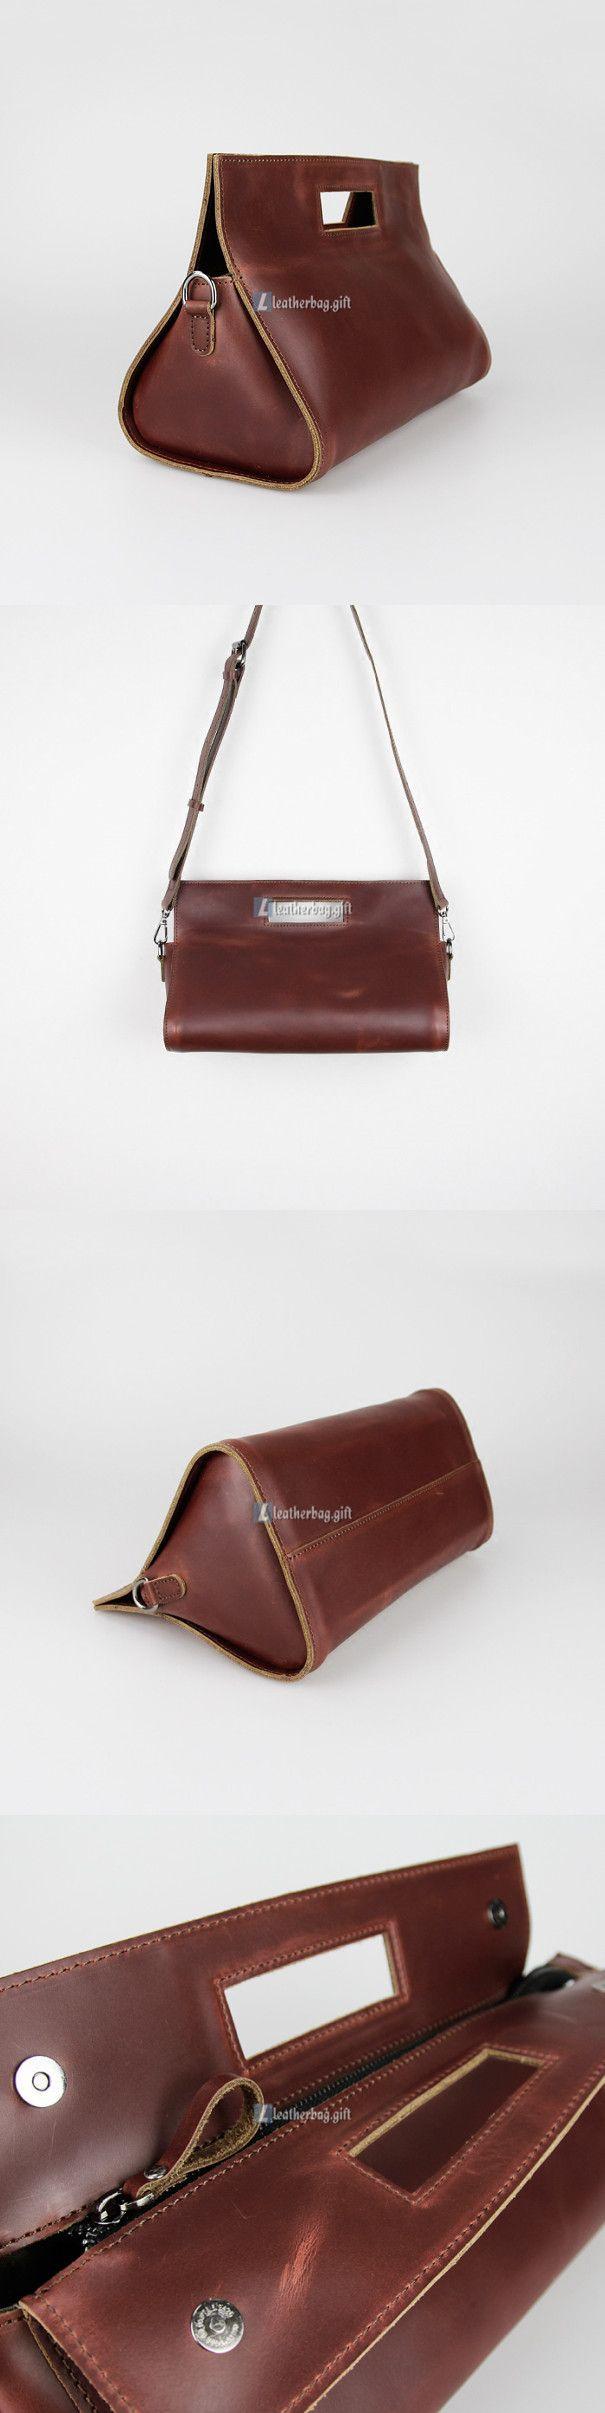 Leather Handbags Shoulder Bag Purses